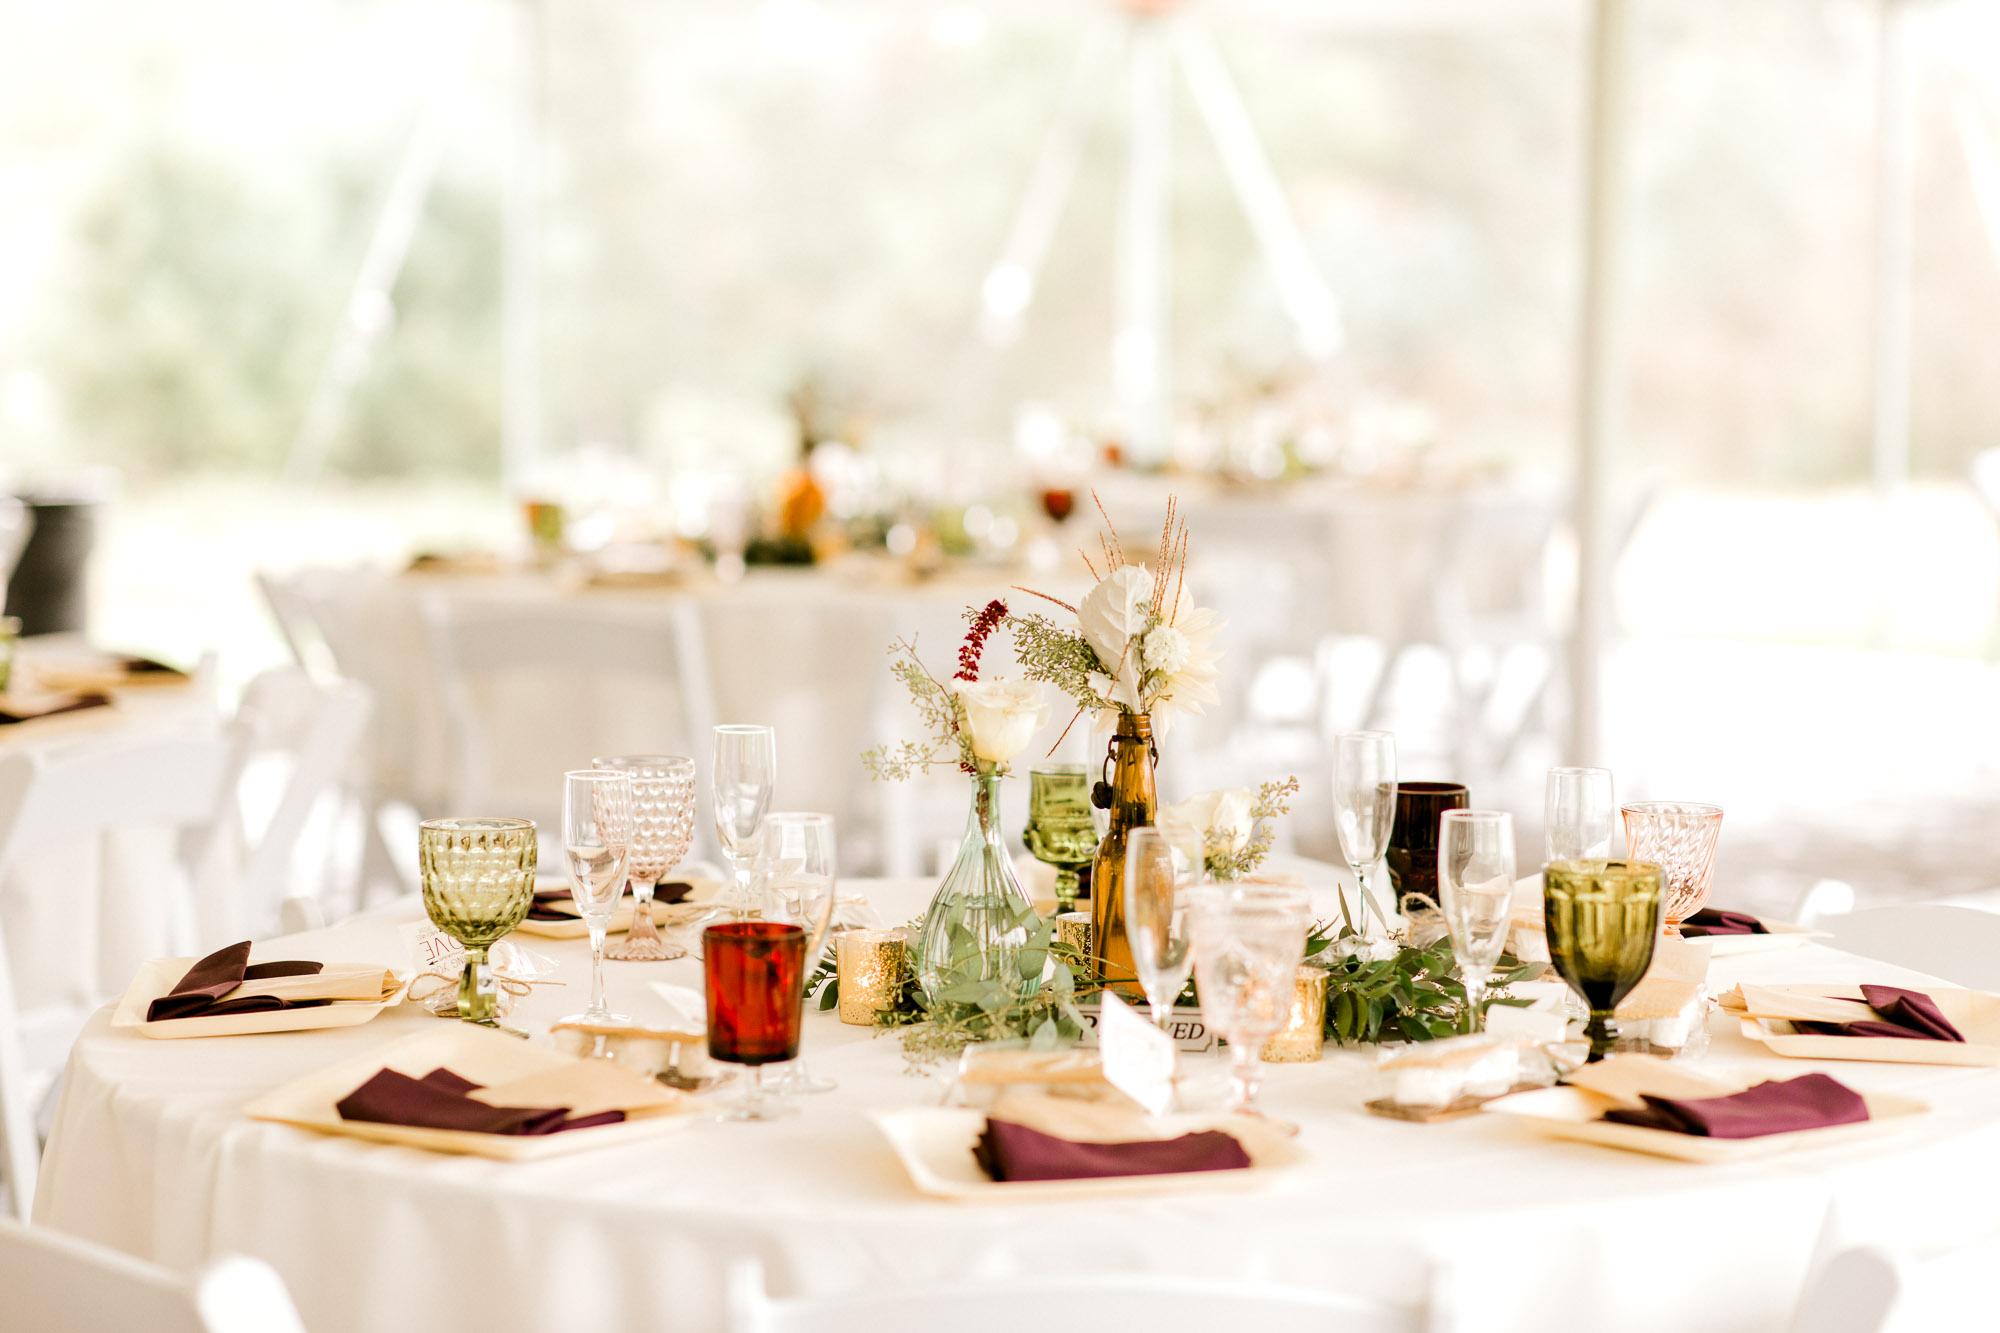 Lodge-at-Raven-Creek-October-wedding-13.jpg